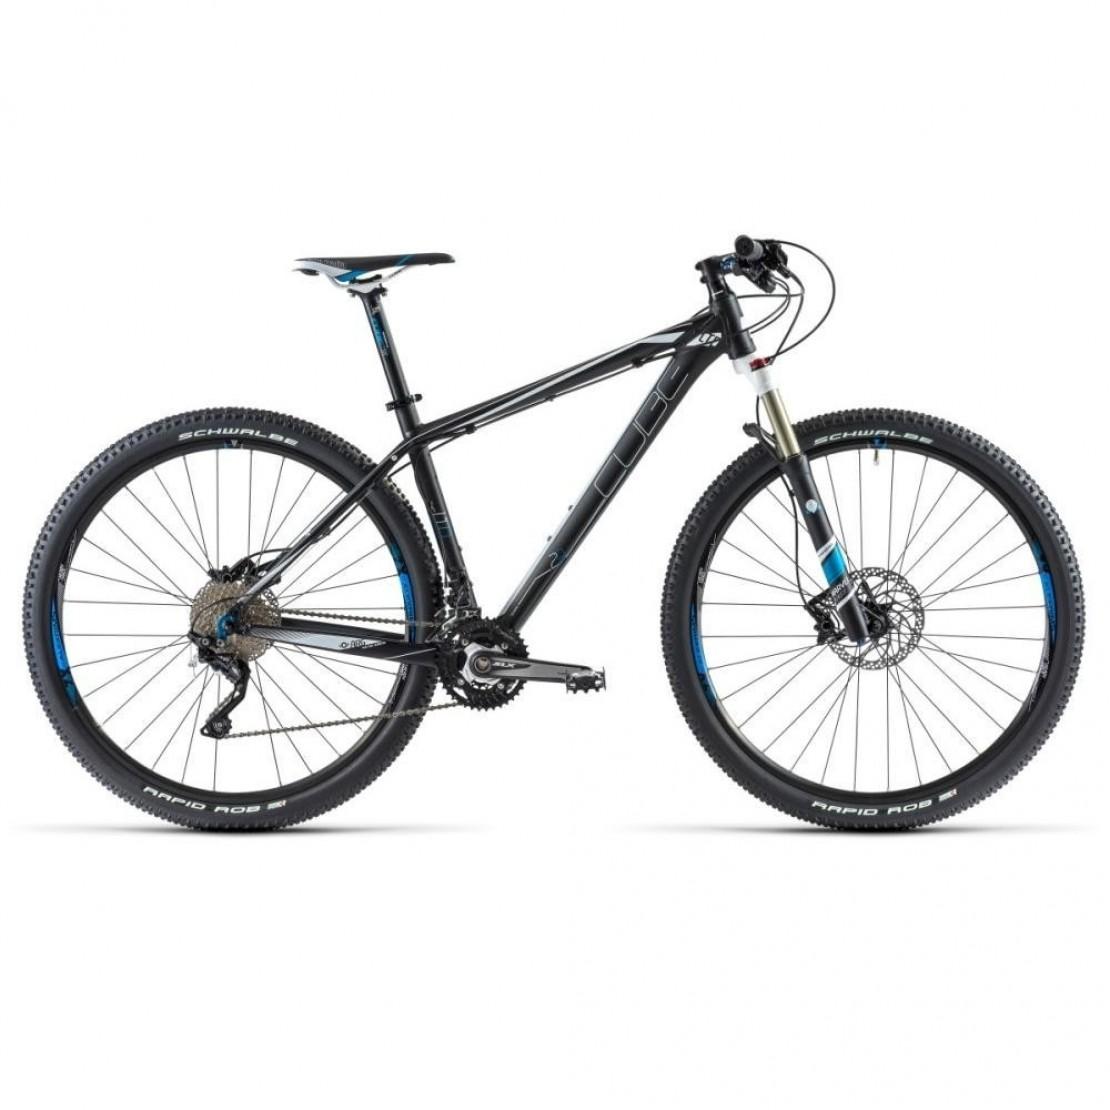 Cube LTD Pro 29 Blackline 2014 29er Mountain bike